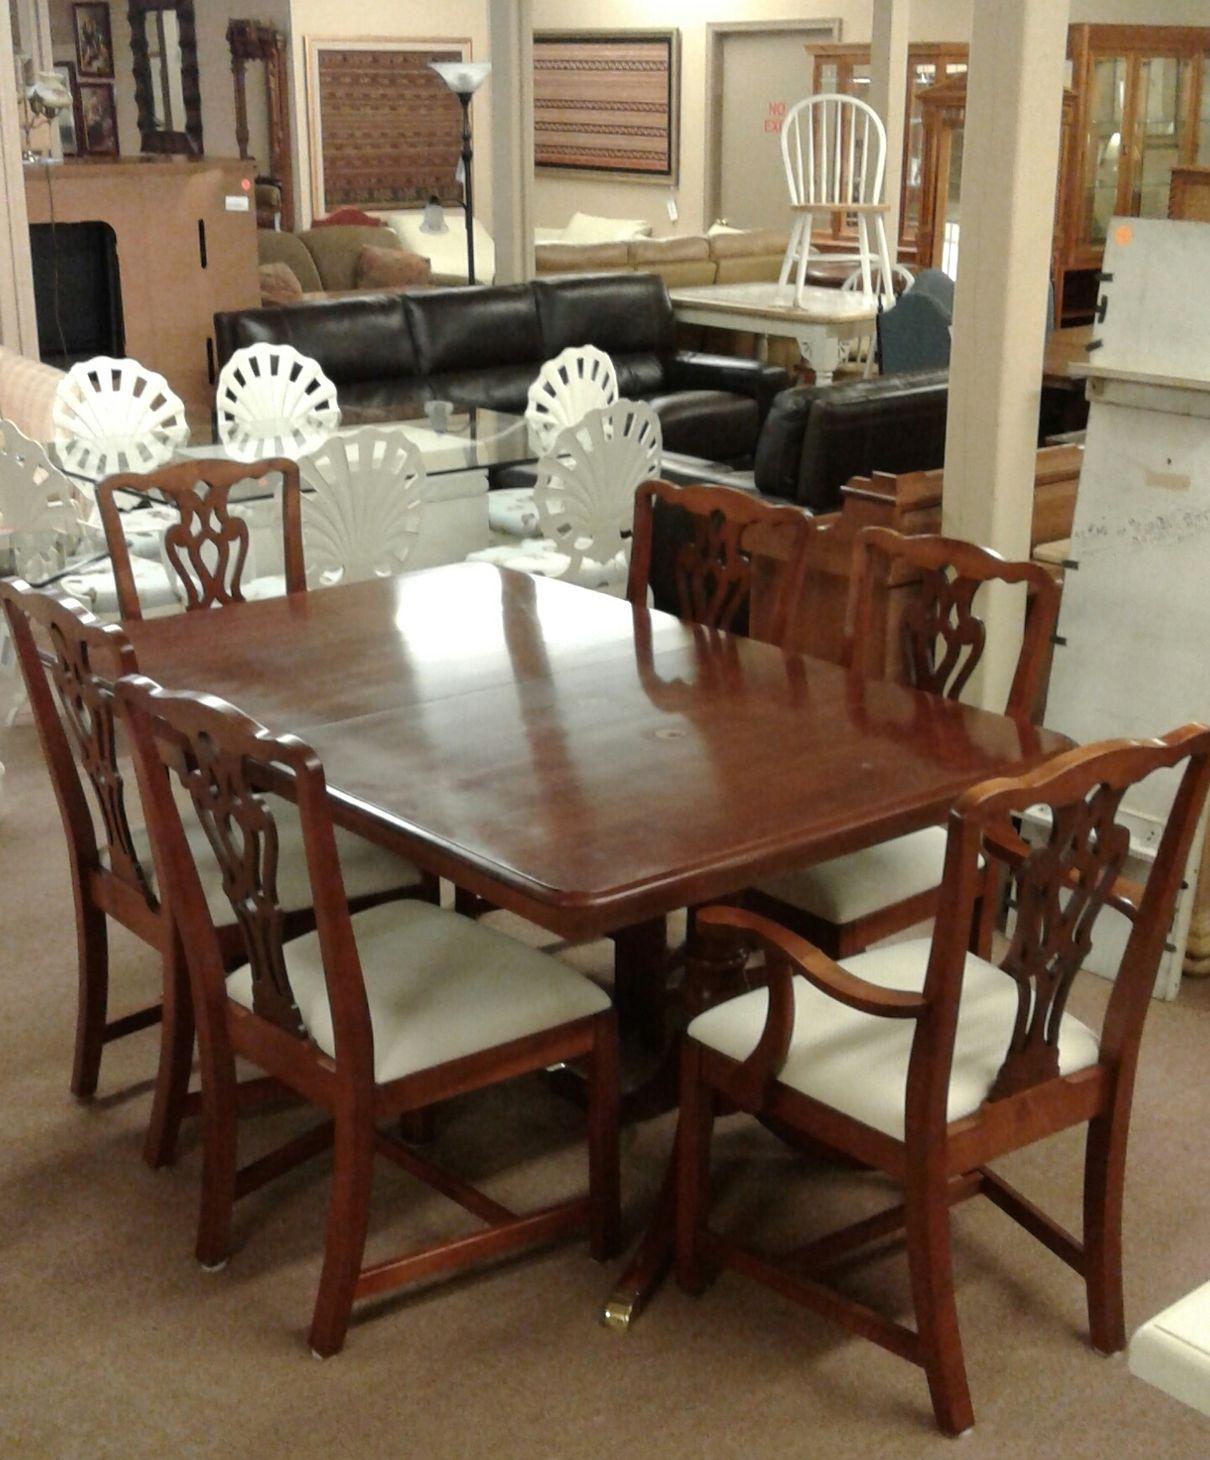 Delmarva Furniture Consignment